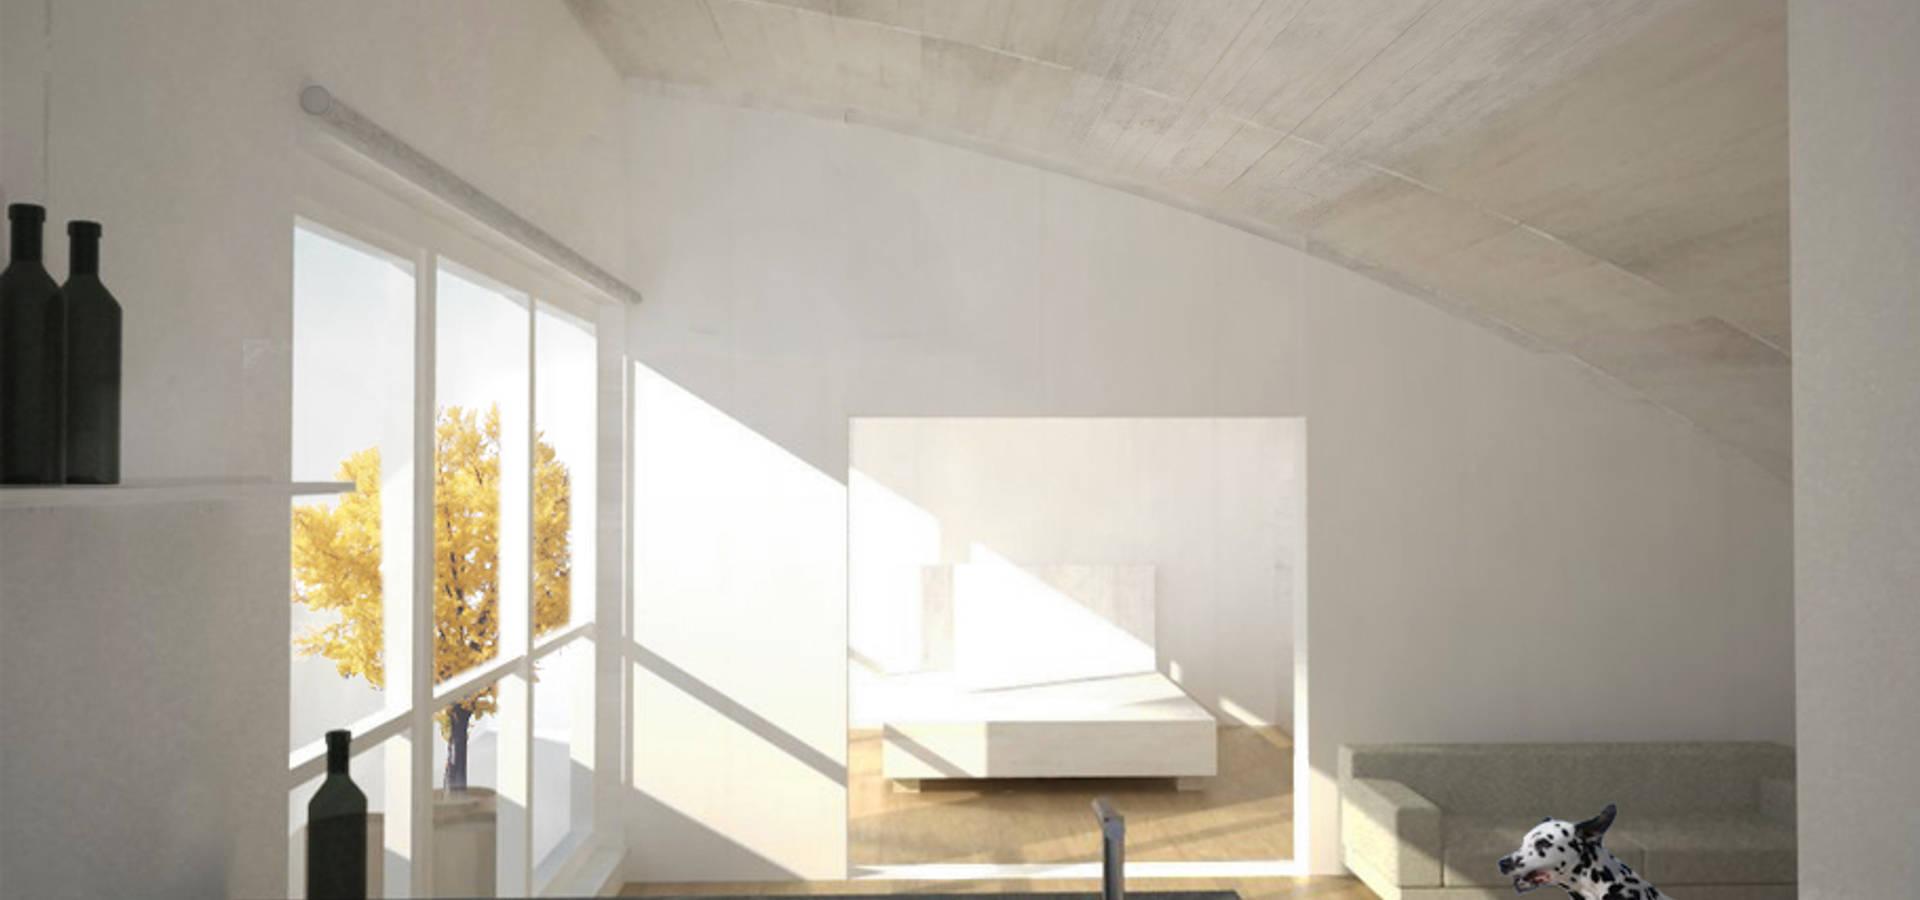 kiosk di brut deluxe architecture design homify. Black Bedroom Furniture Sets. Home Design Ideas